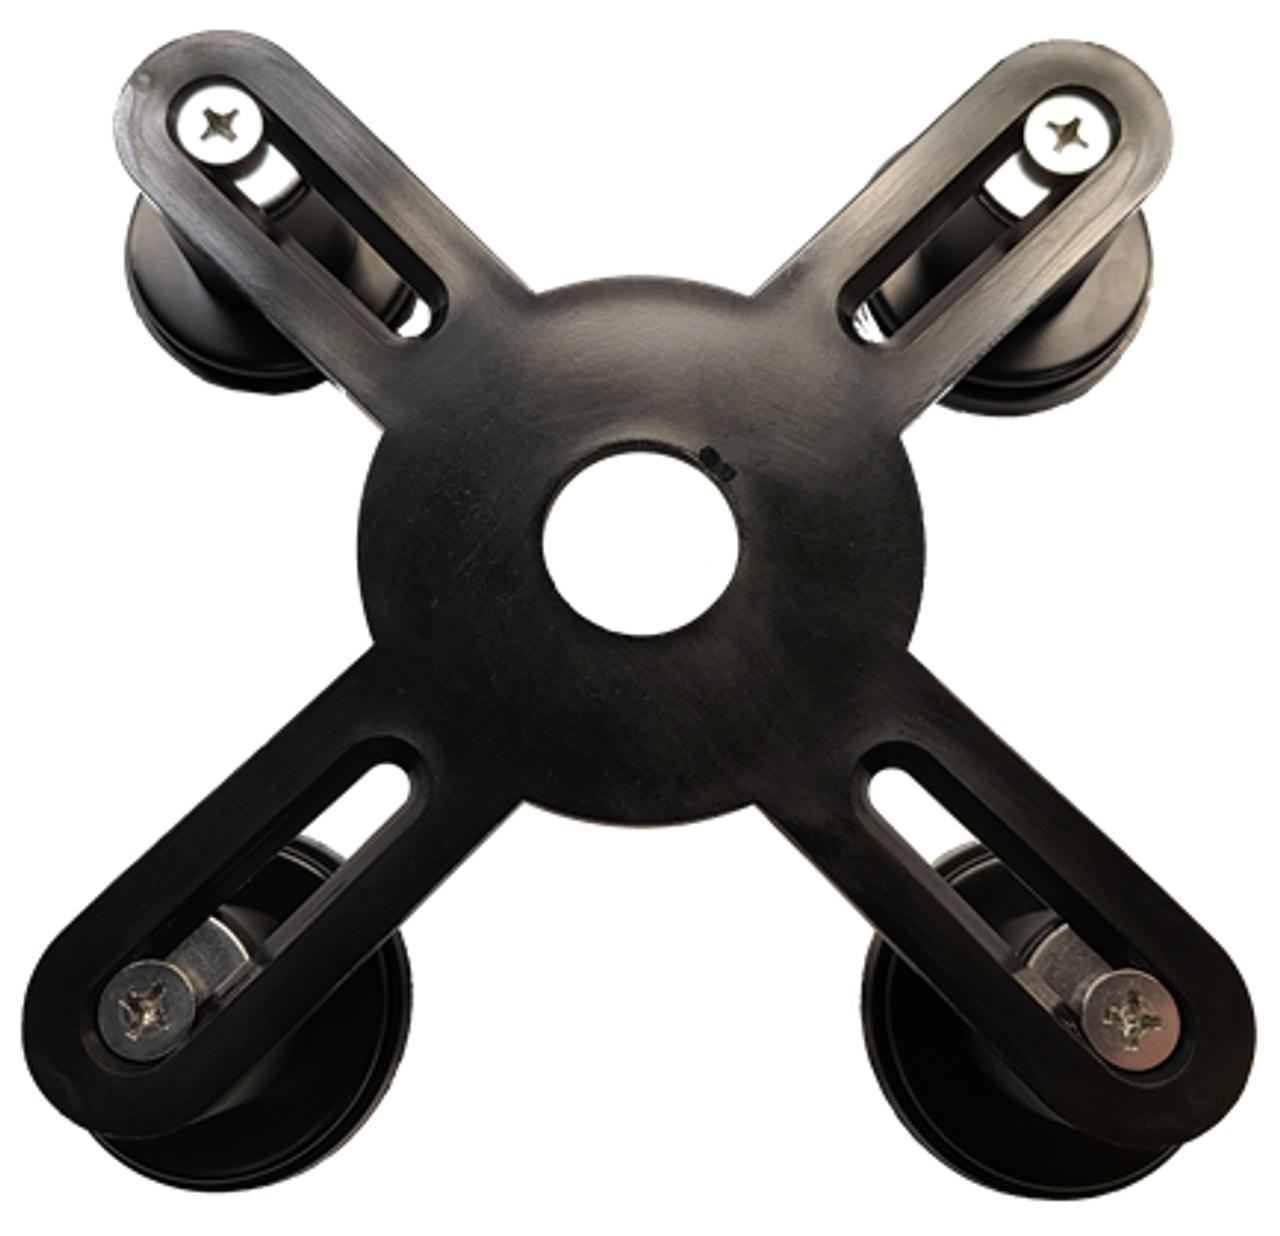 Rugged Adjustable M-Lander - Top View